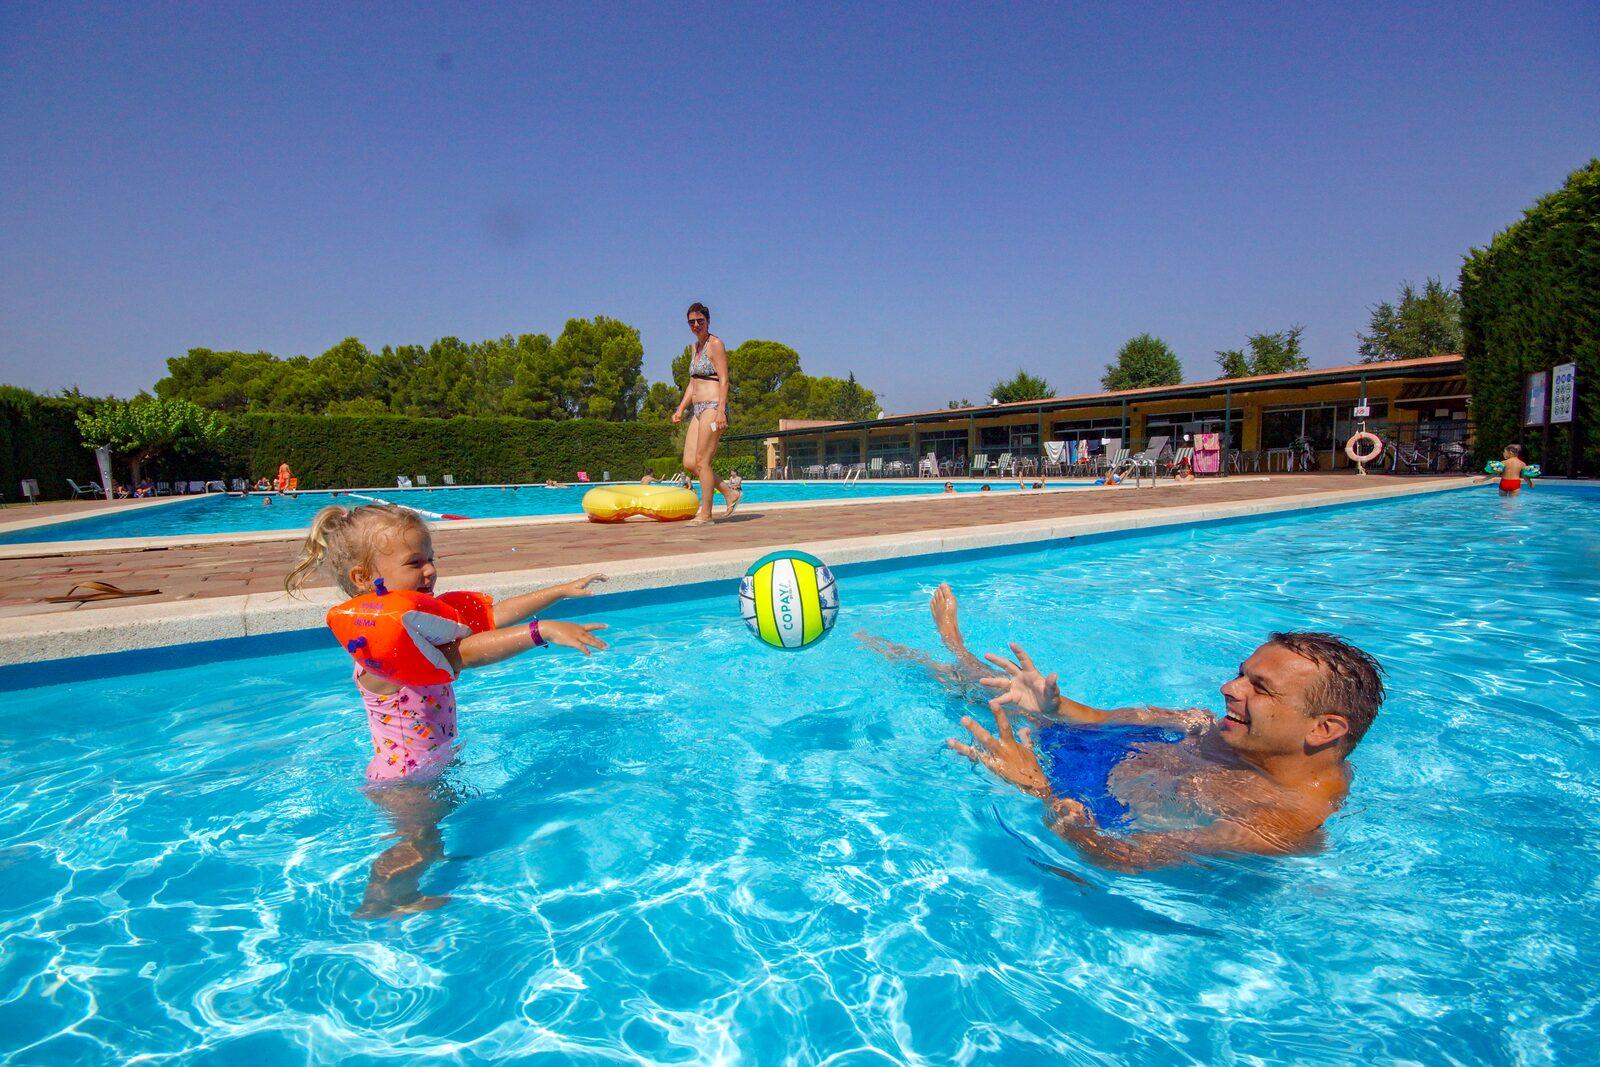 Zwembad Vell Emporda vader met kind